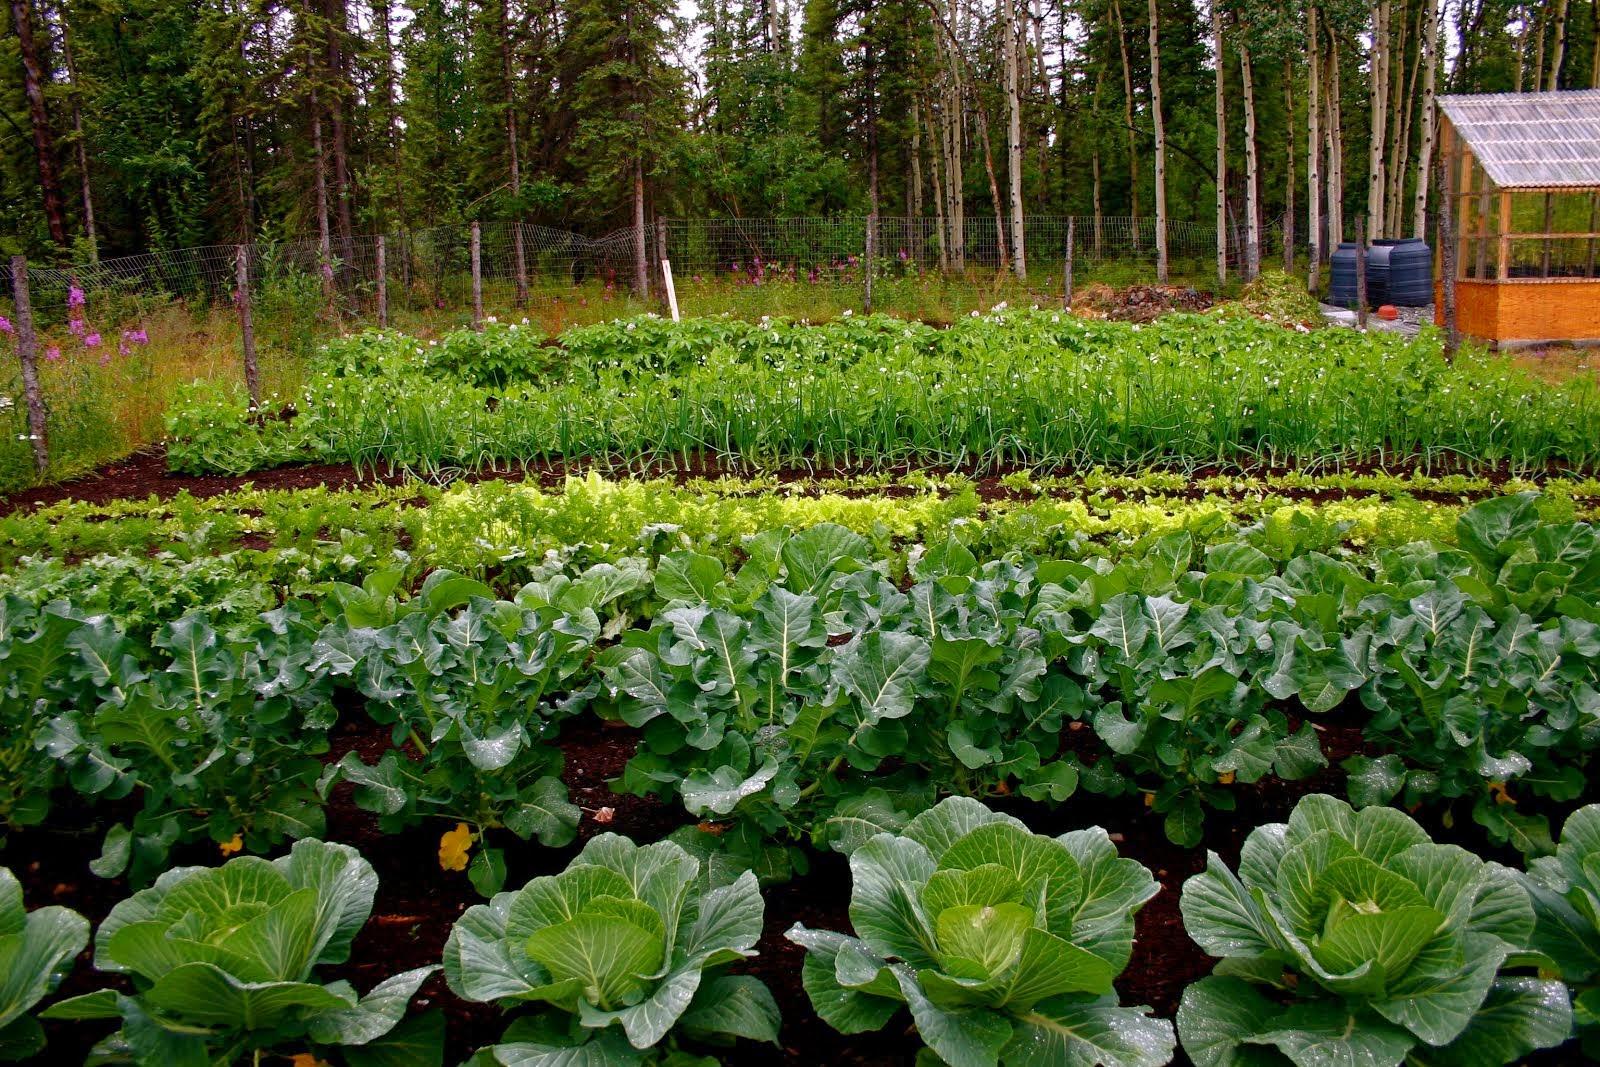 Alaska Farm & Garden Trail: Learn About Alaska's Arctic Gardens & Its Livestock